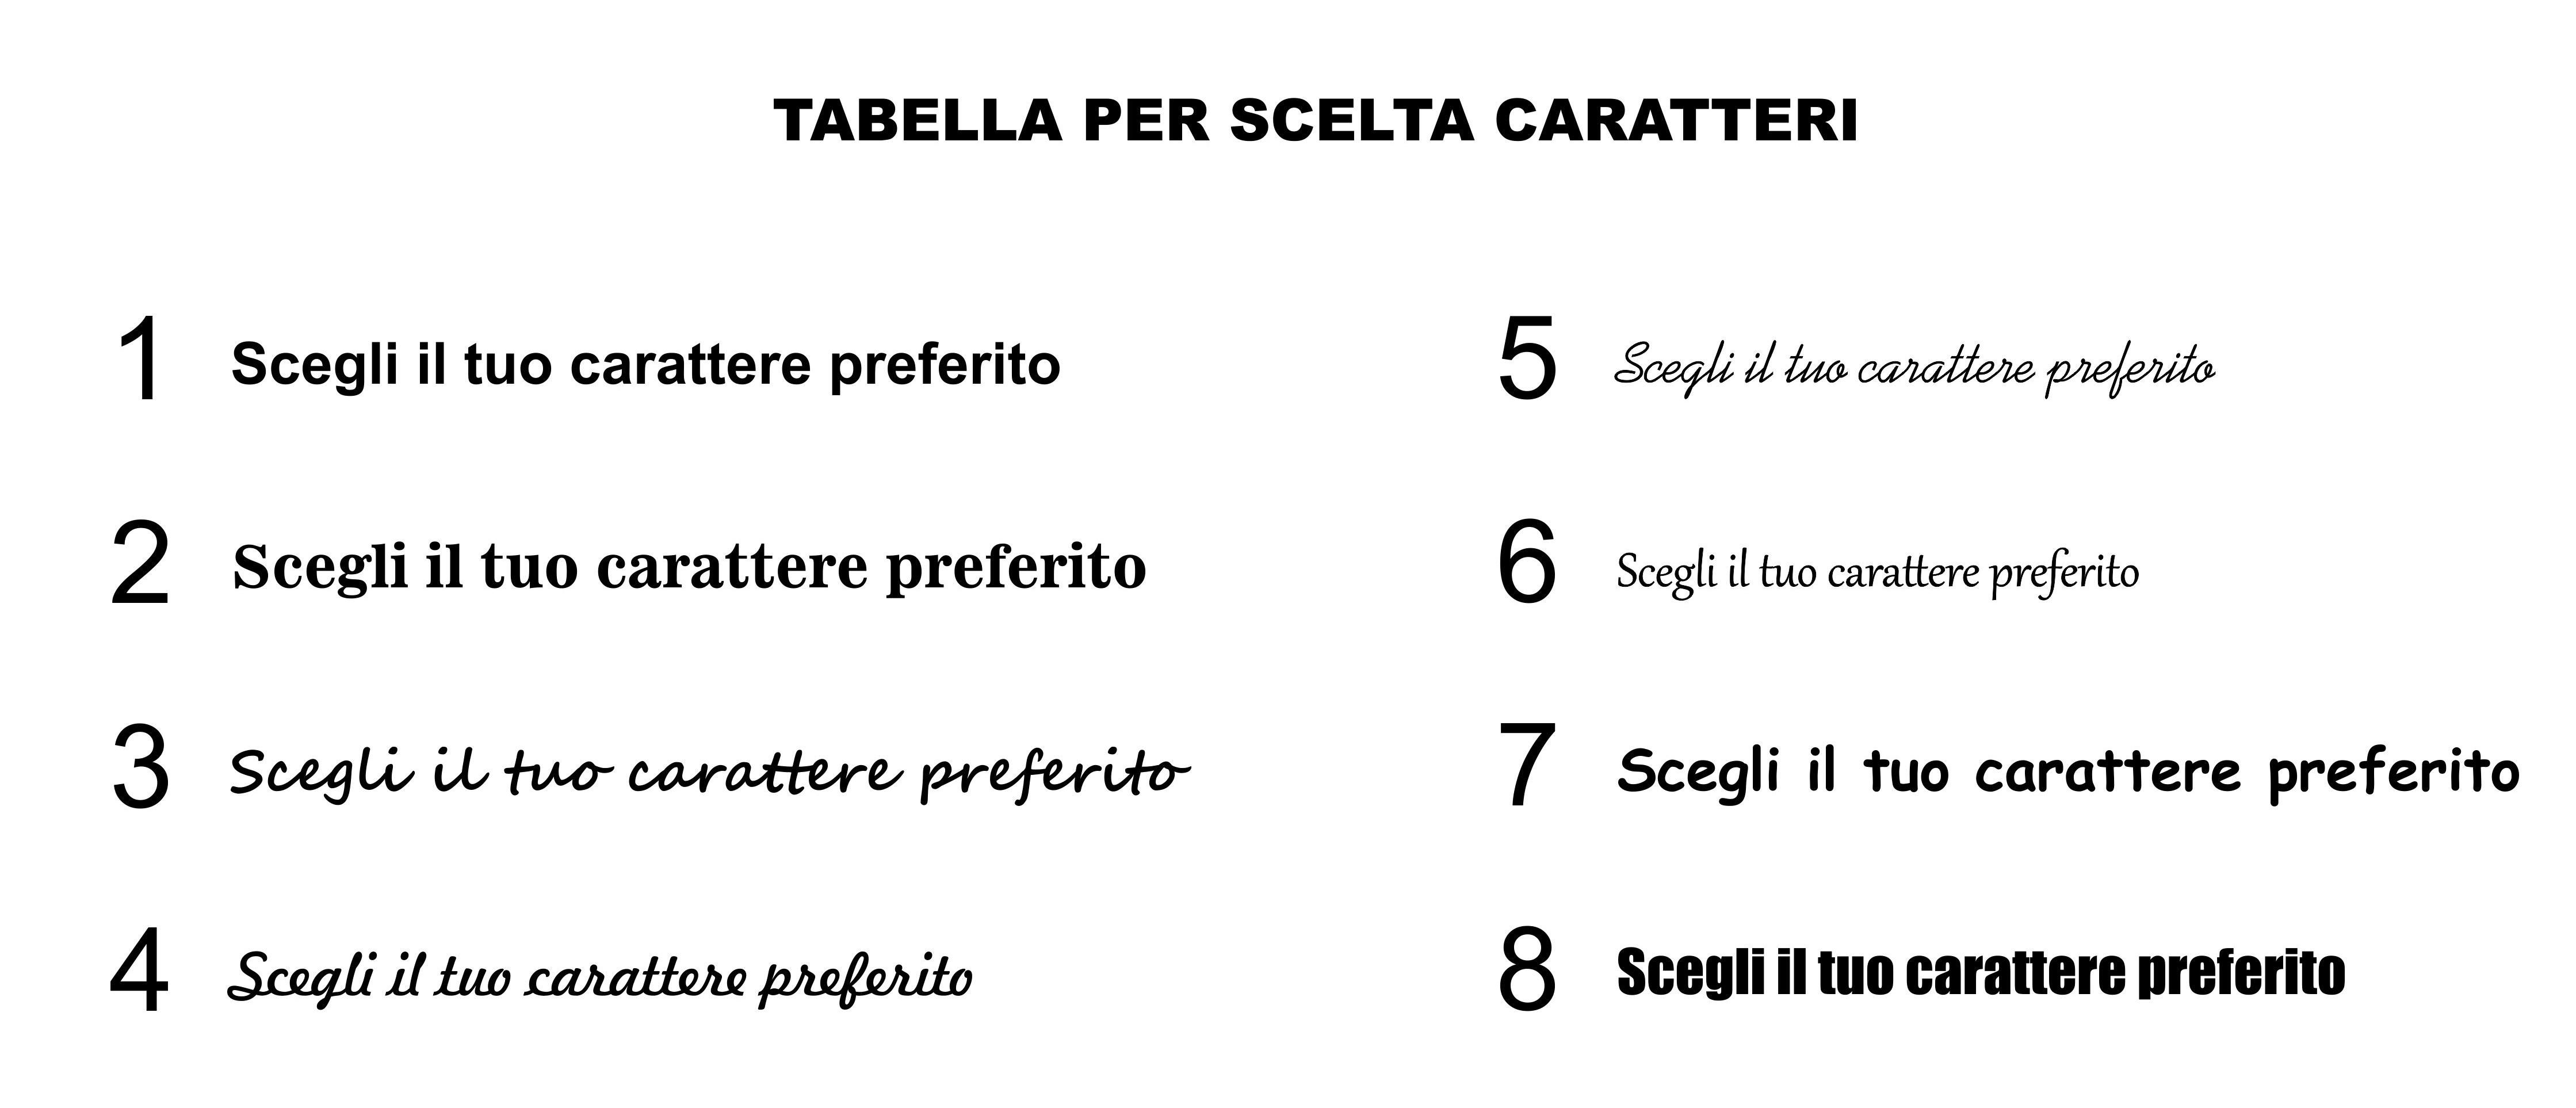 www.personalizzazionilaser.it